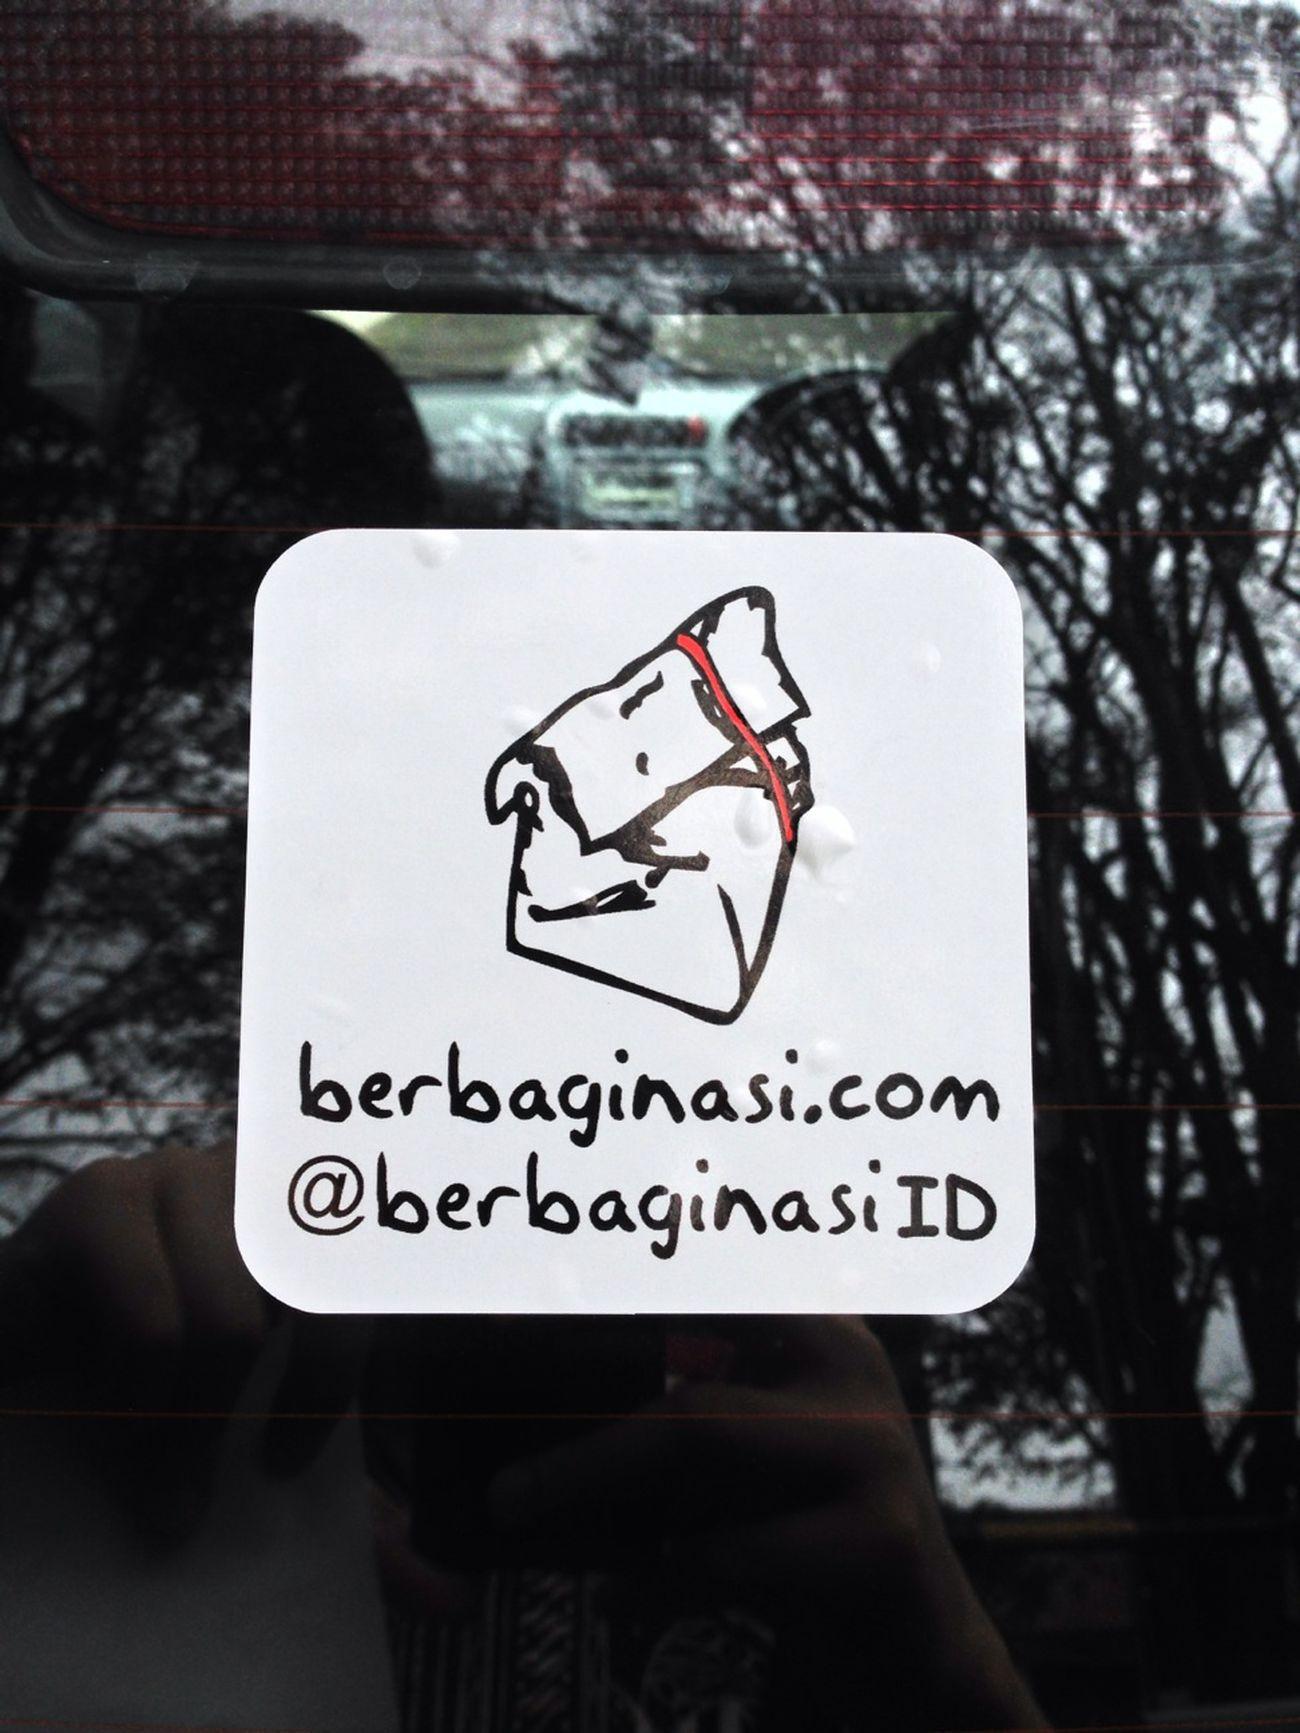 @berbaginasiID @BerbaginasiPKU @Berbaginasi_GRT @BerbaginasiBTM @berbaginasiJKT @BerbaginasiPKU @BerbaginasiPKU @BerbaginasiTSM